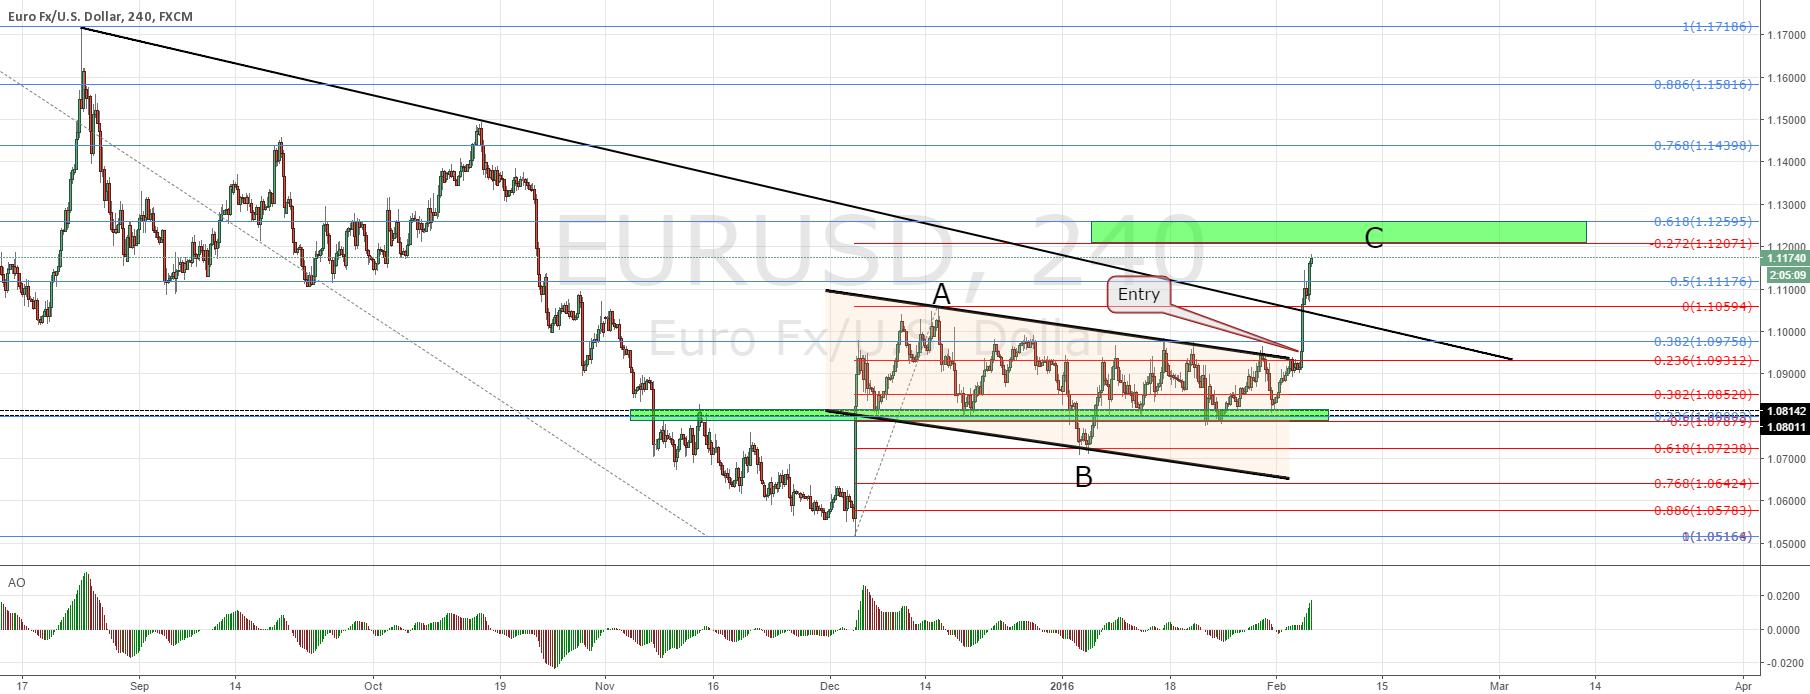 EURUSD closing in on target